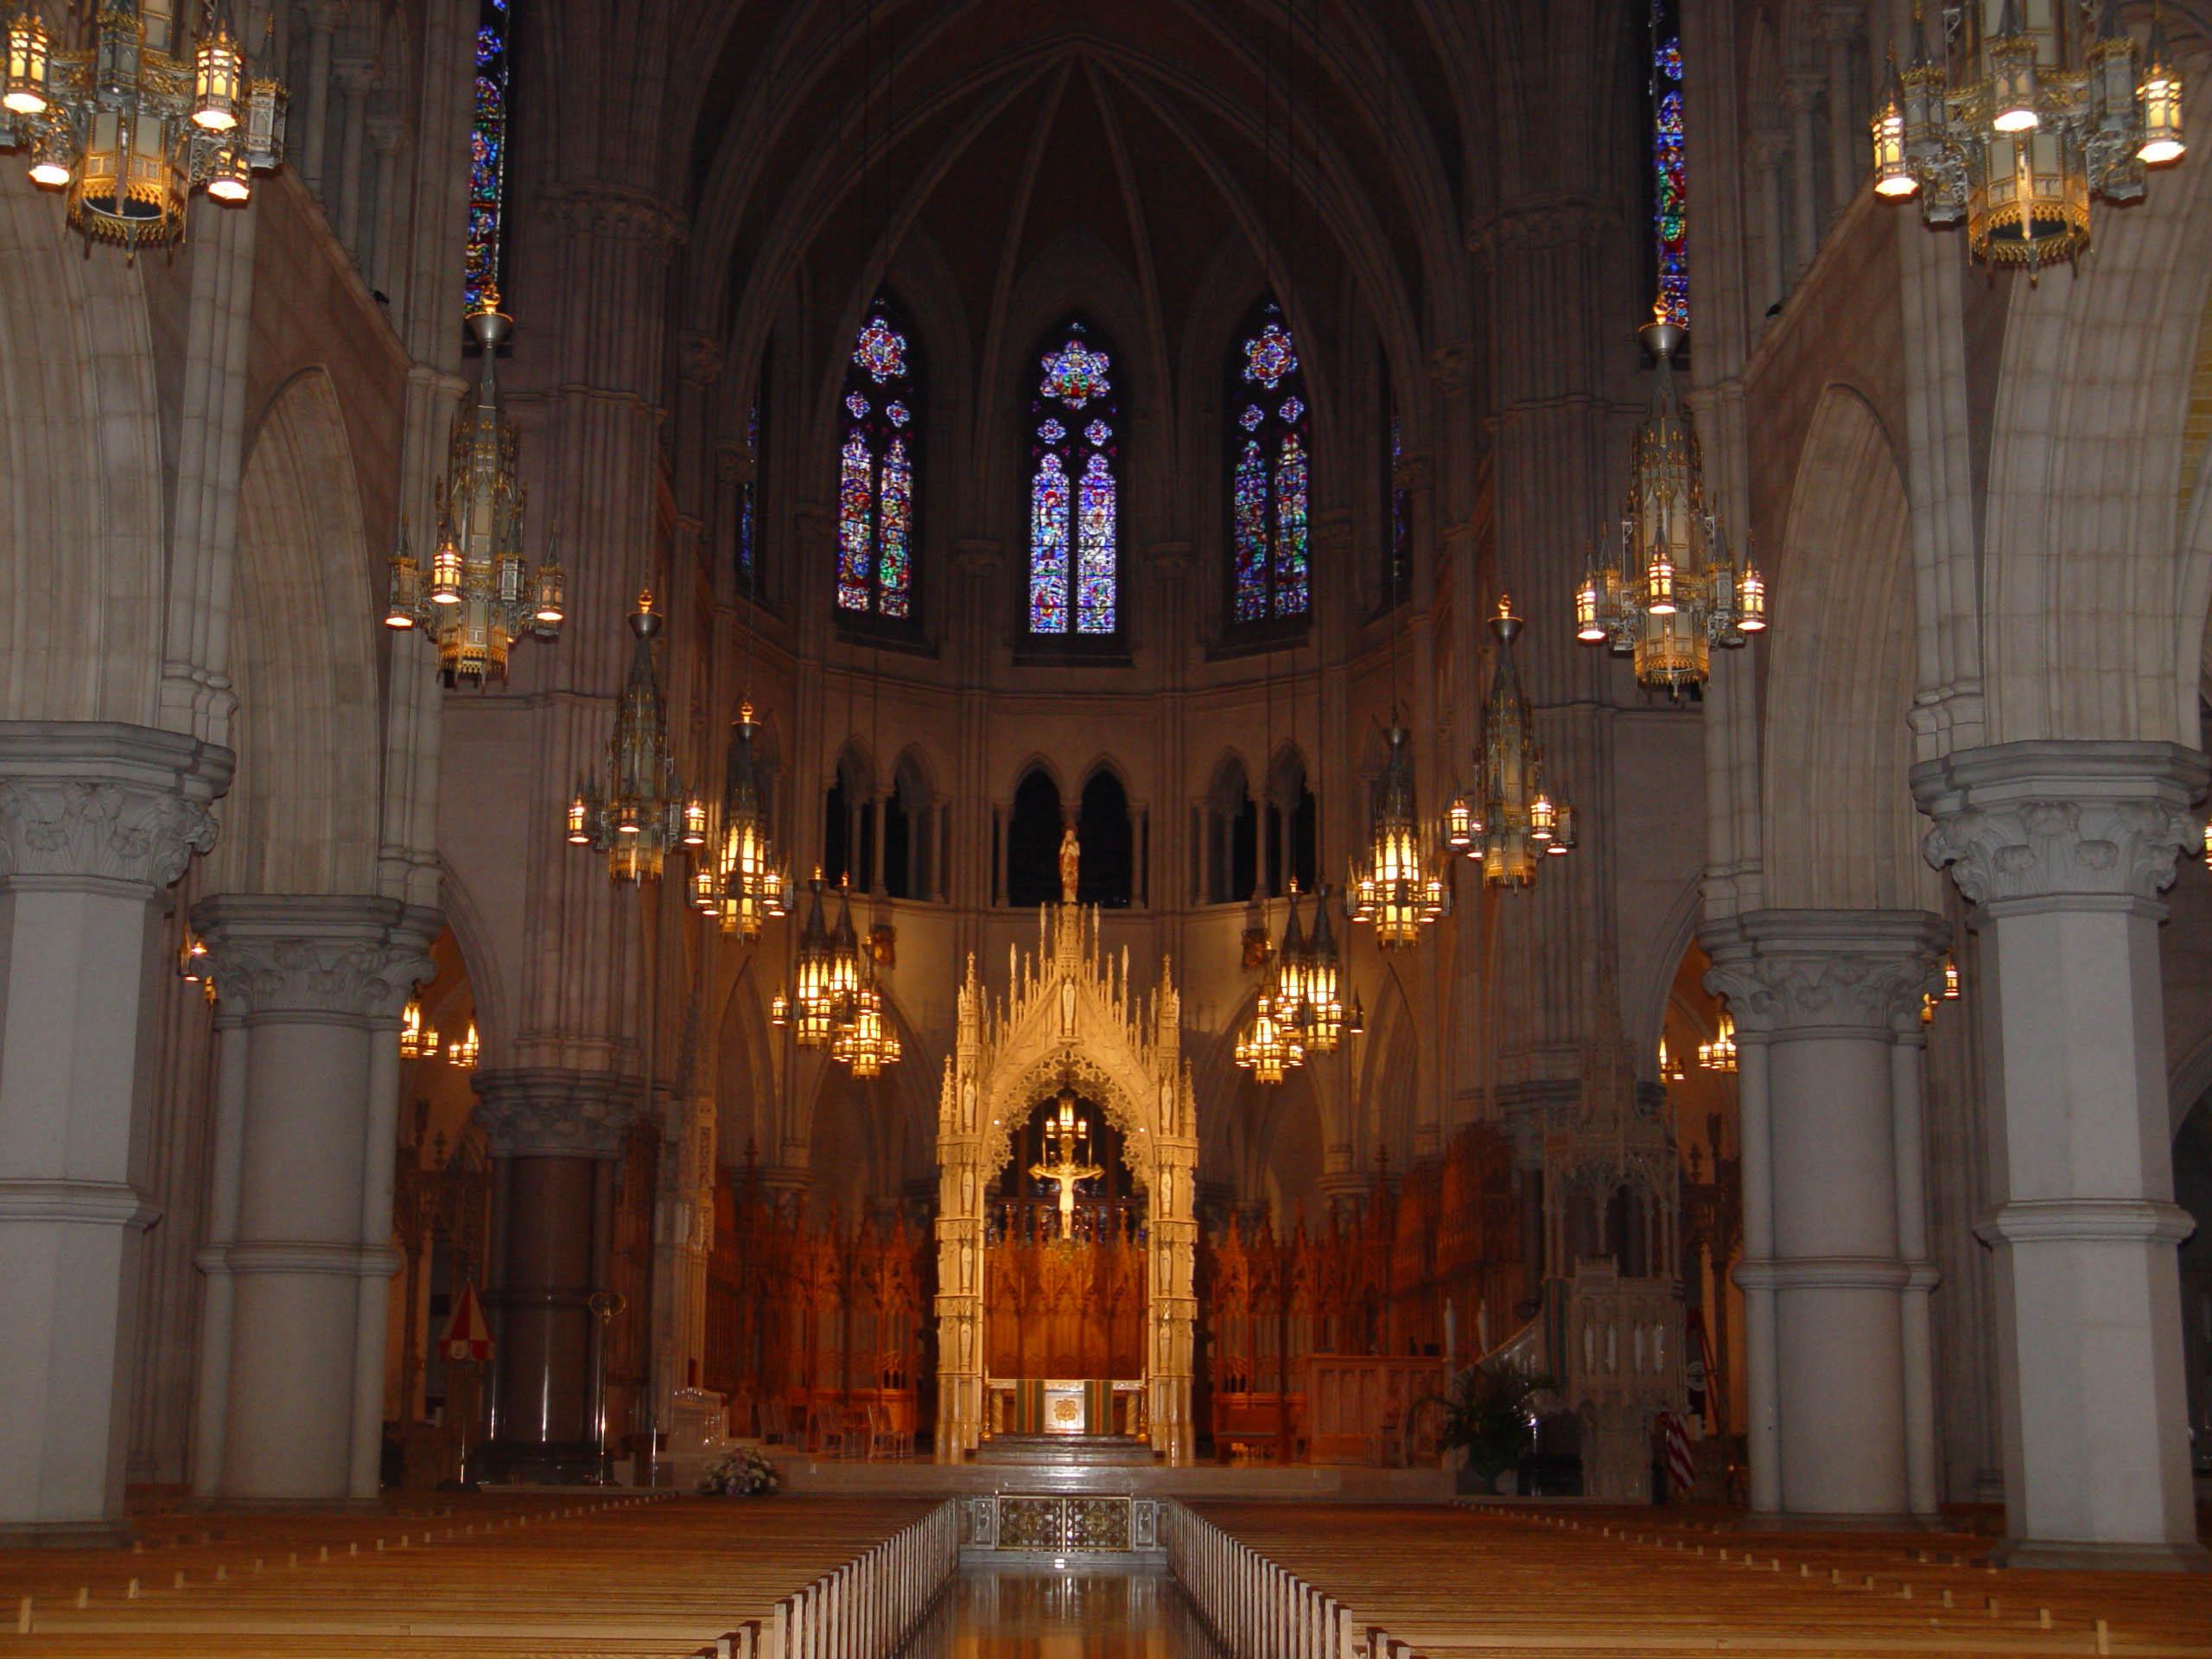 34b274b01fb47cfe8e1e_cathedral.jpg